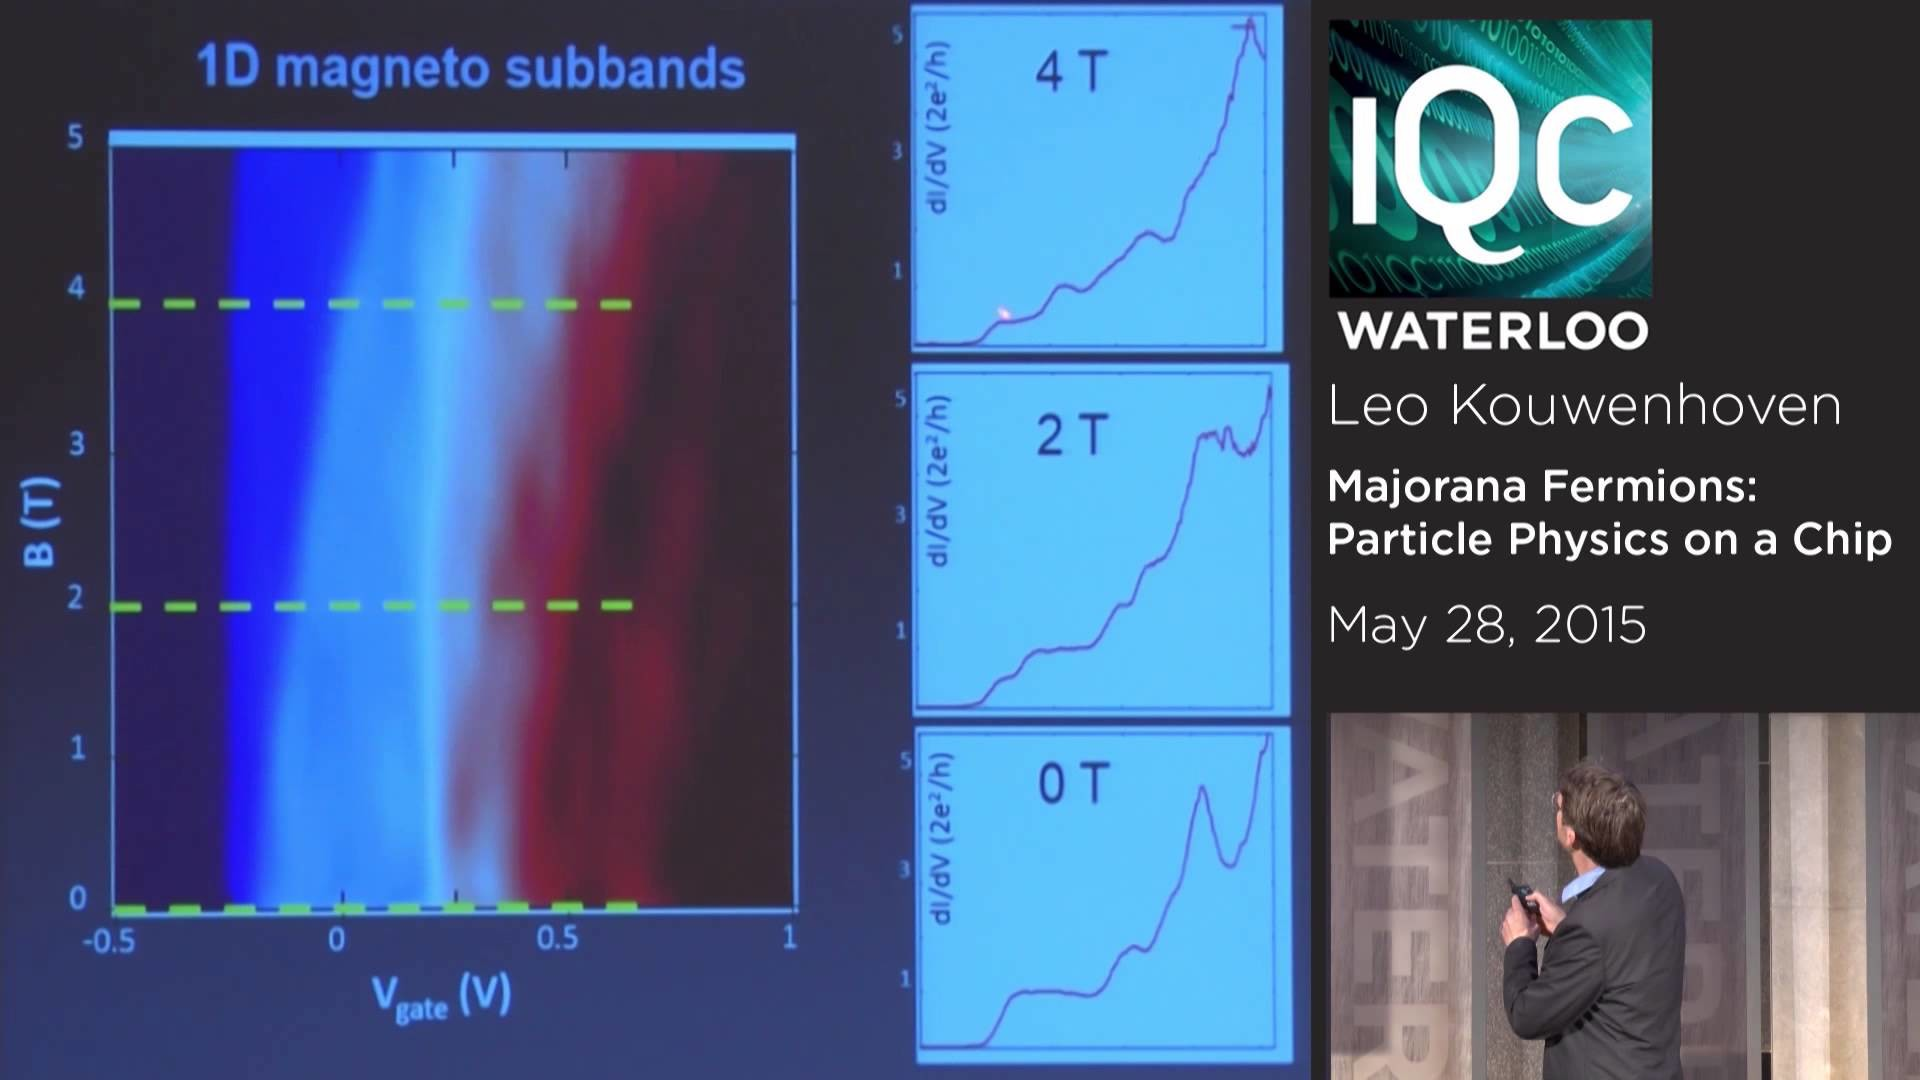 Majorana Fermions: Particle Physics on a Chip- Leo Kowenhoven – May 28 2015